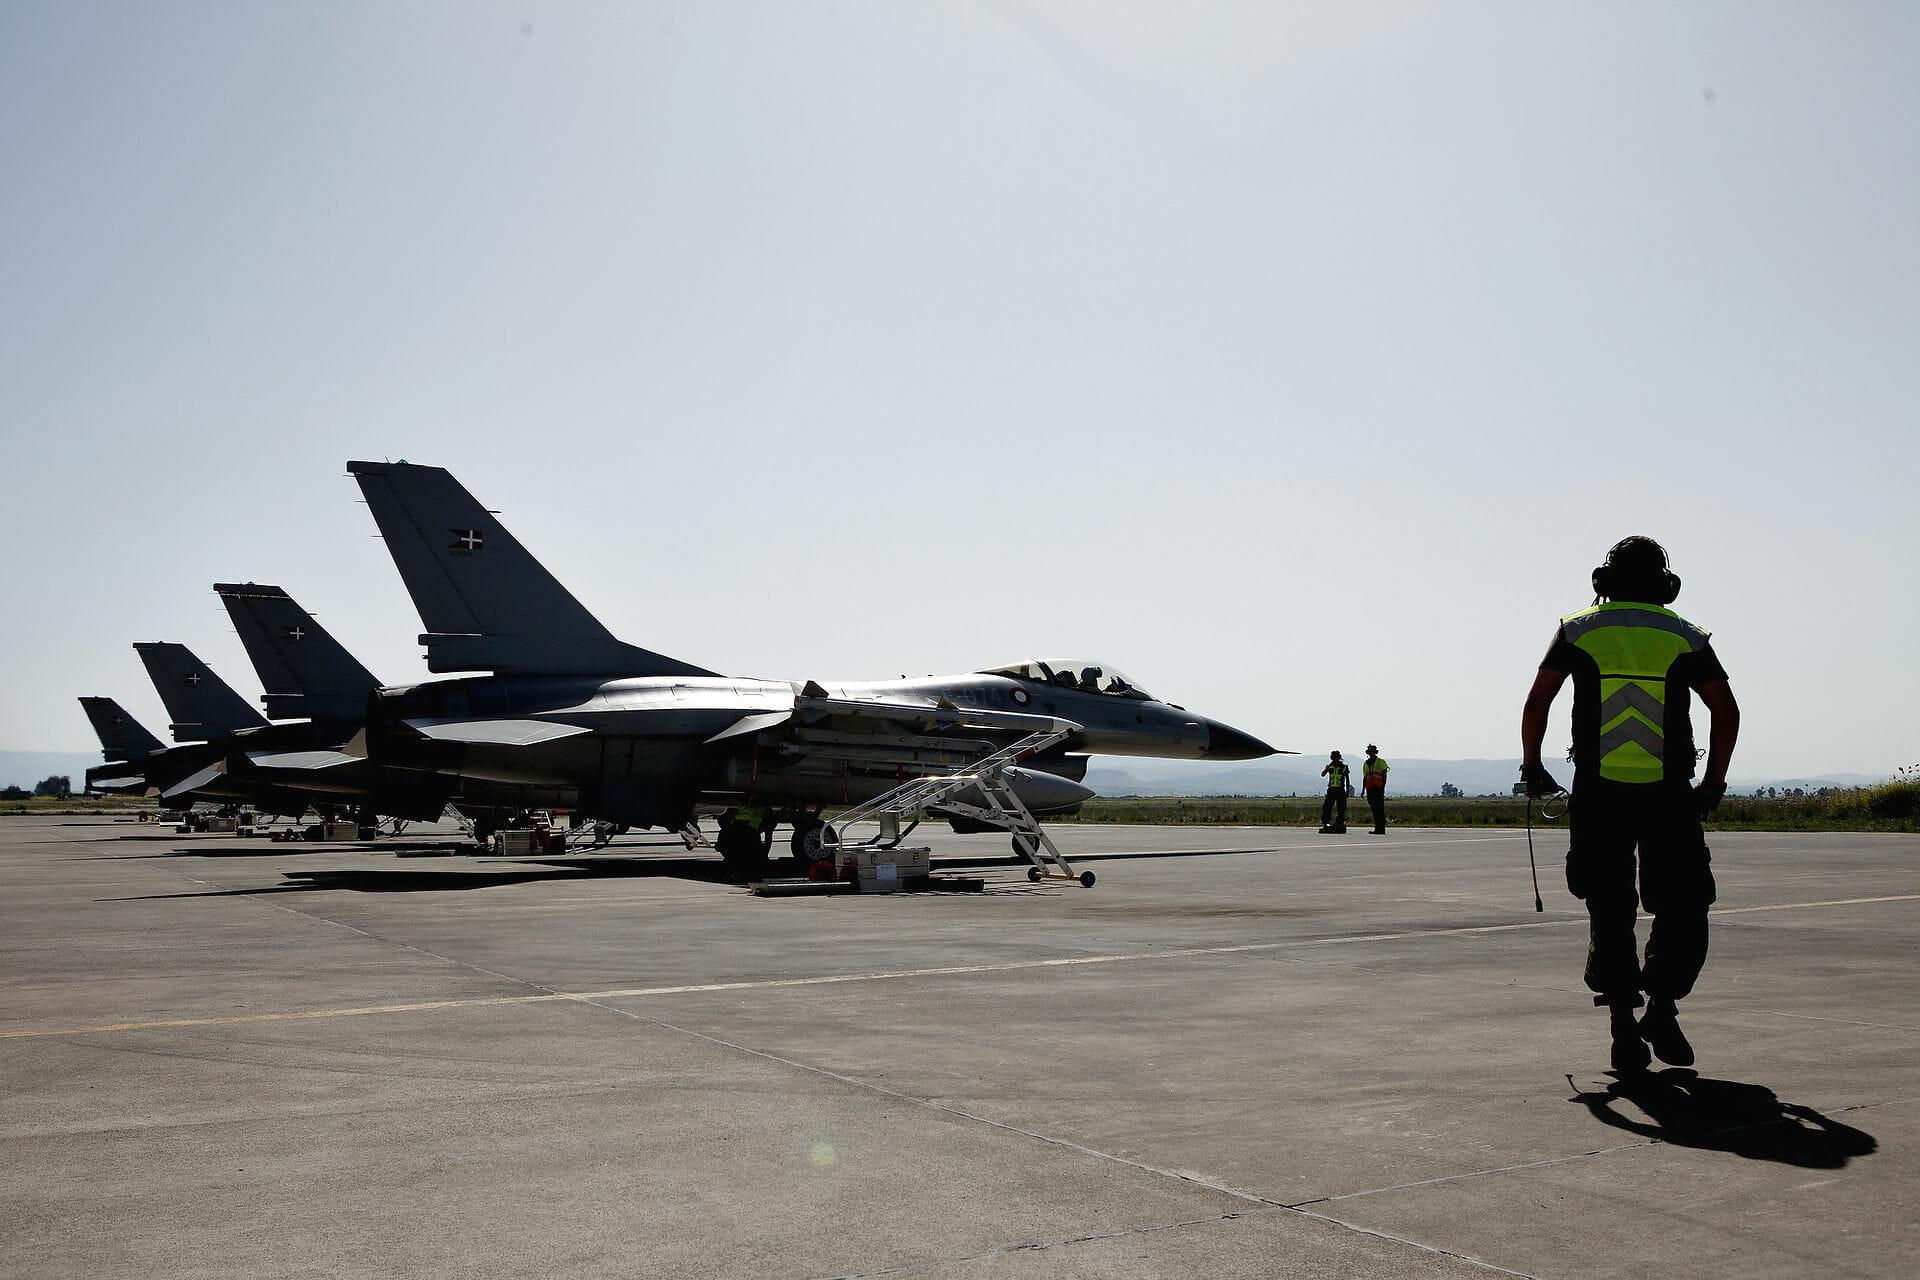 FAKTA: Koalitionen mod Libyen